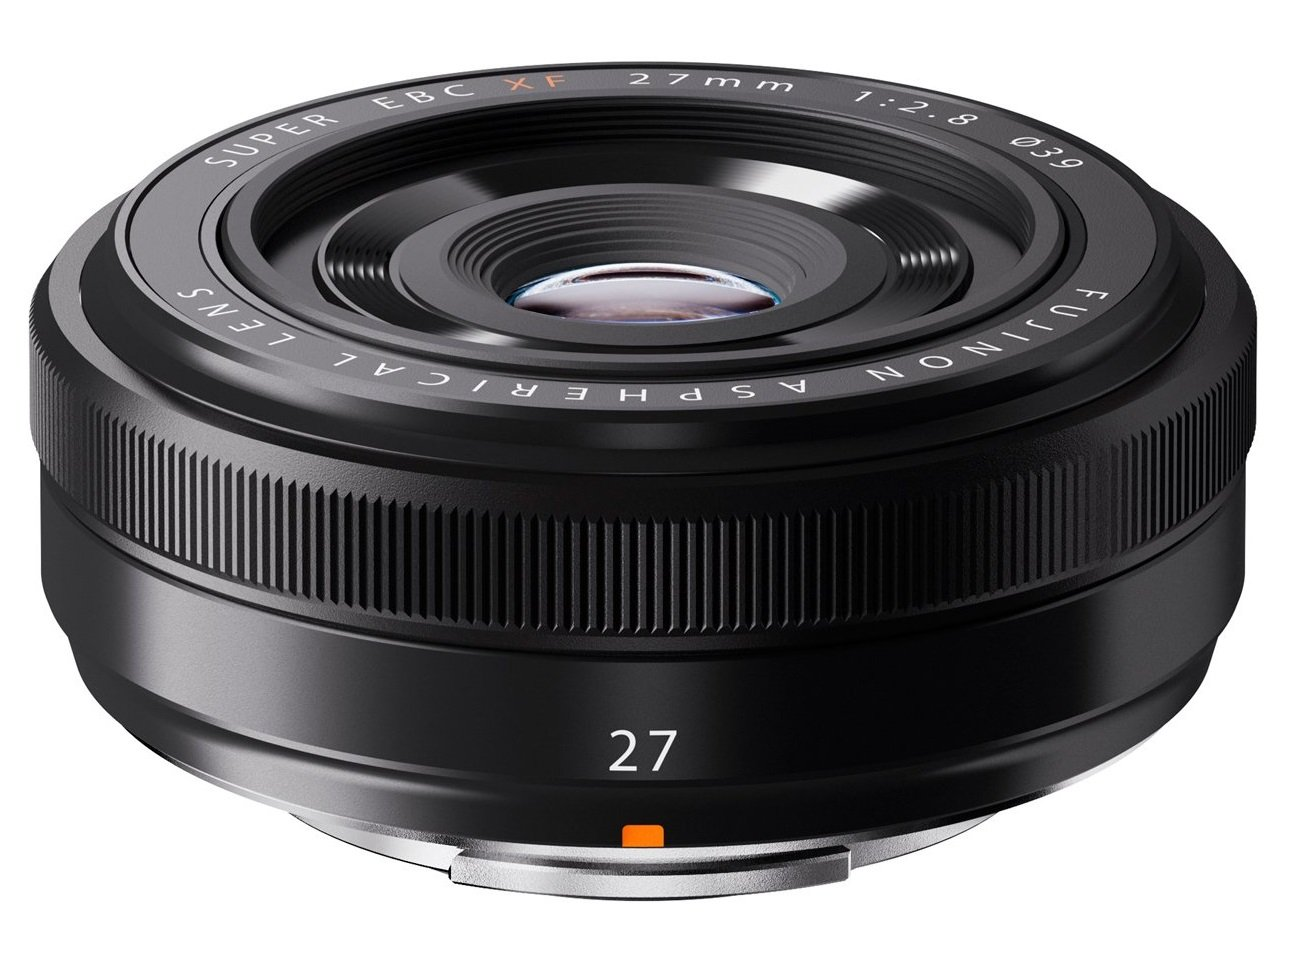 Fujifilm XF Objetivo para Fujifilm distancia focal fija mm apertura f diámetro: